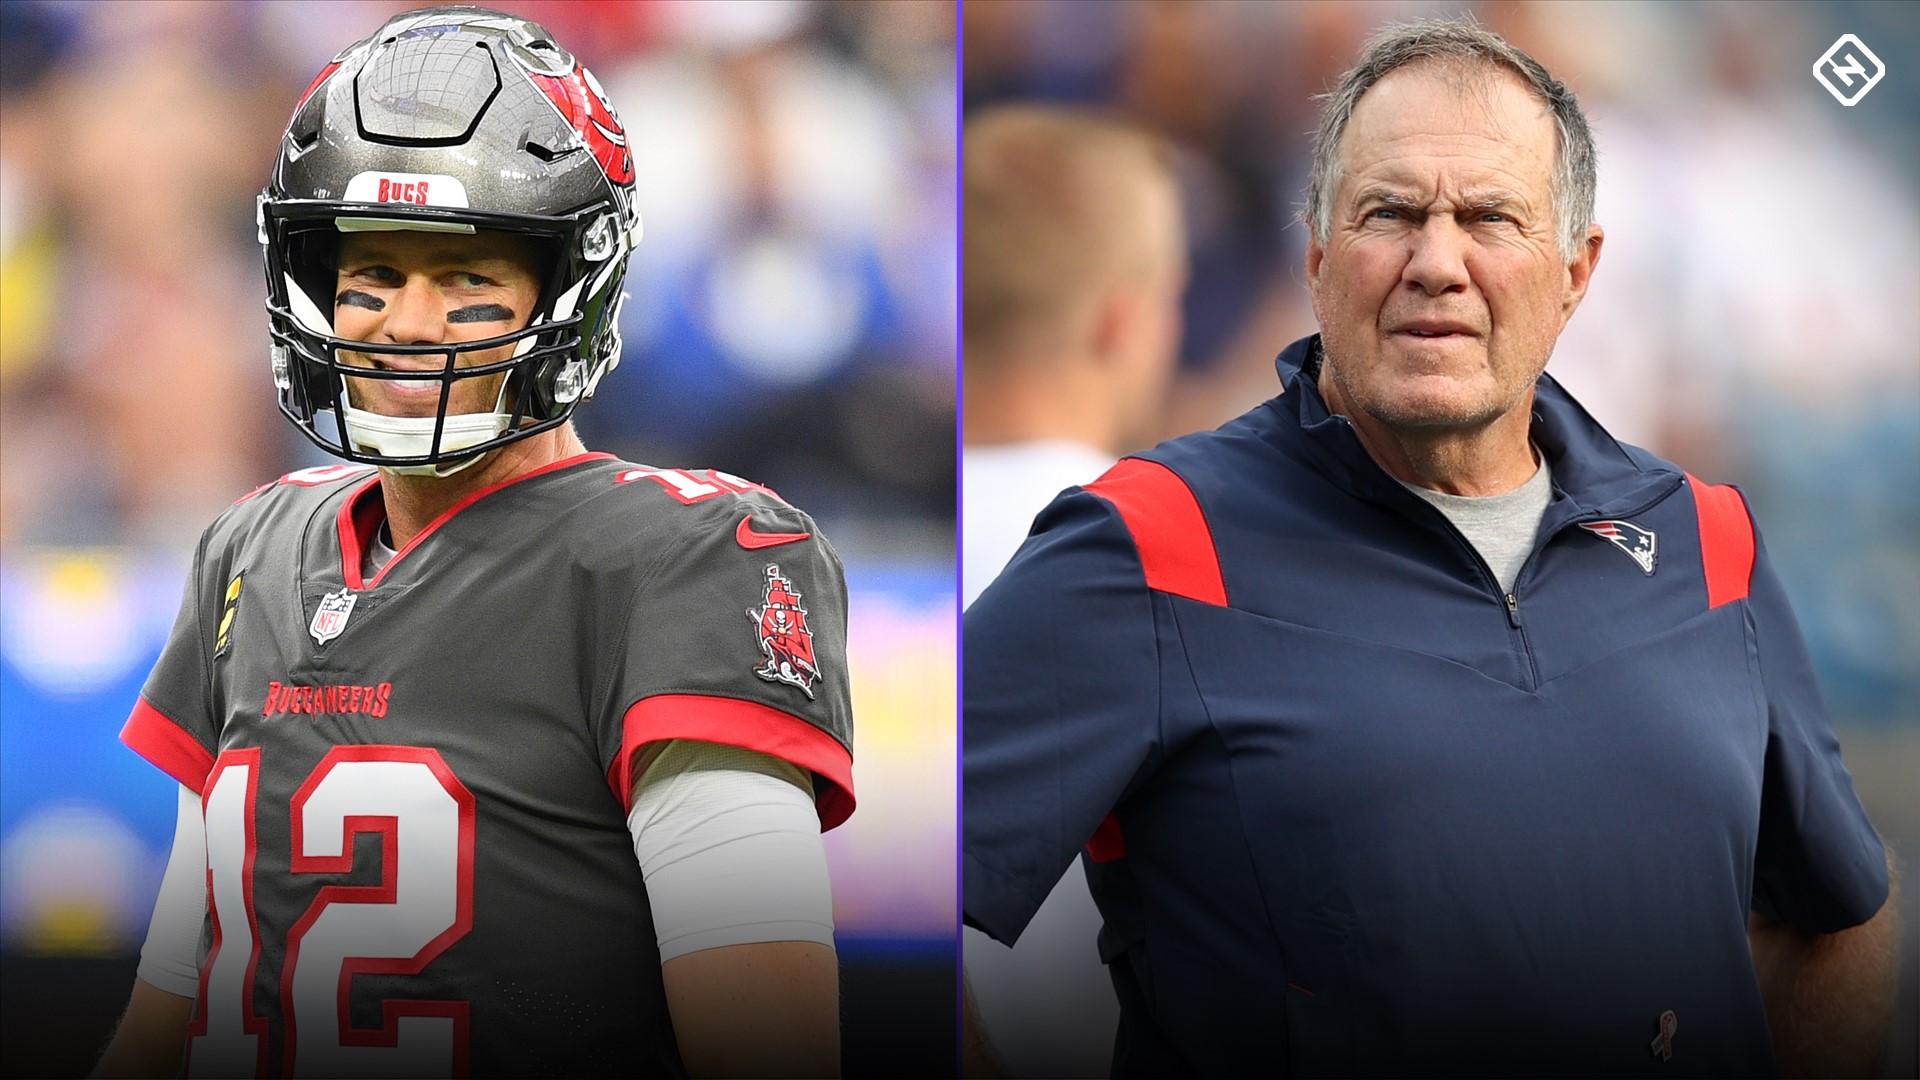 Tom Brady vs. Bill Belichick: Who needs to win Buccaneers vs. Patriots  more? | Sporting News